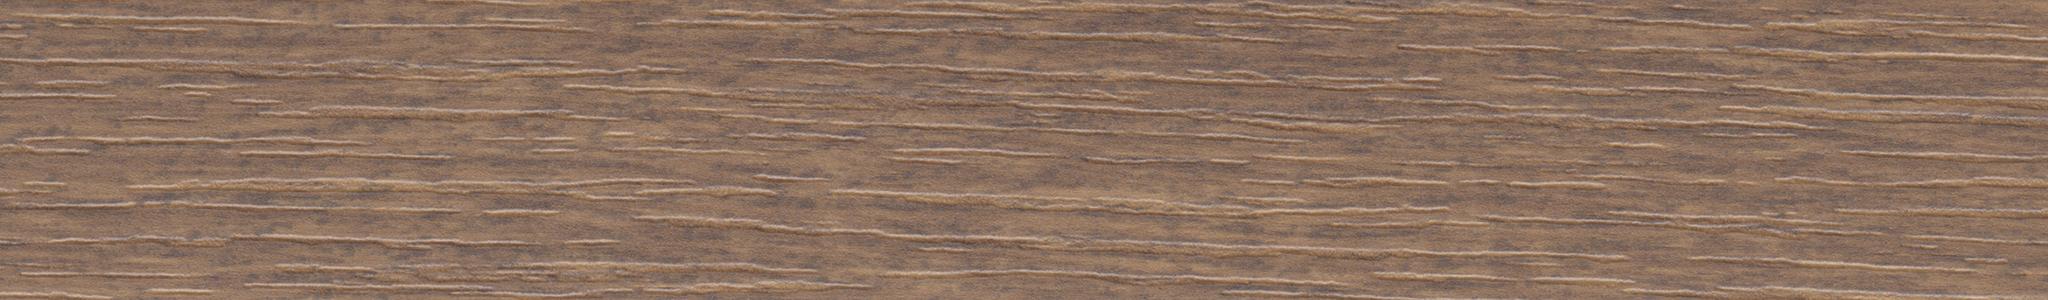 HD 244411 ABS Edge Native Oak Antique Pore